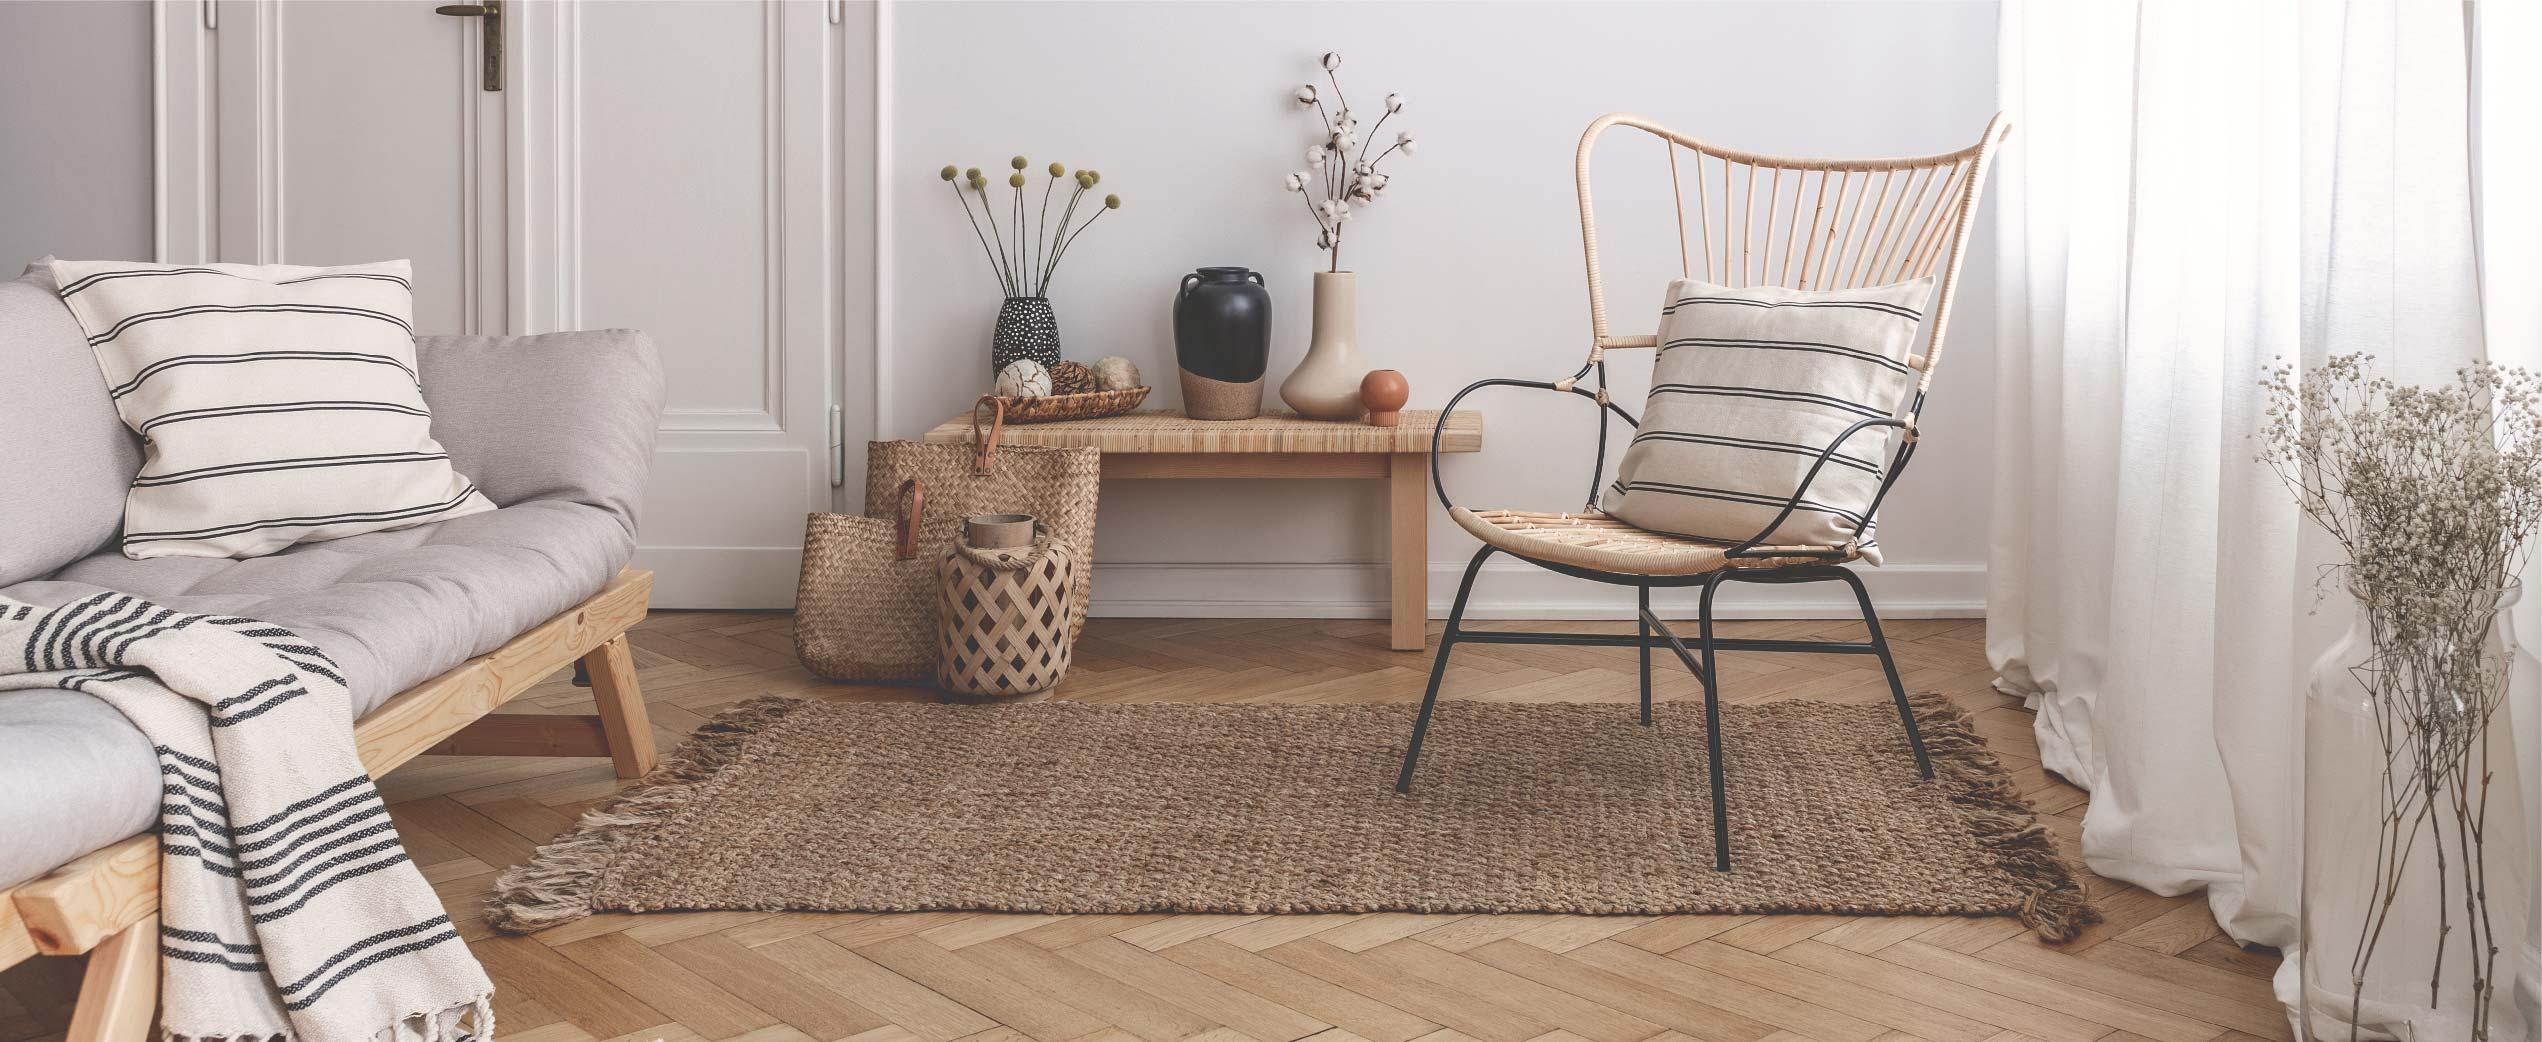 Rent Furniture